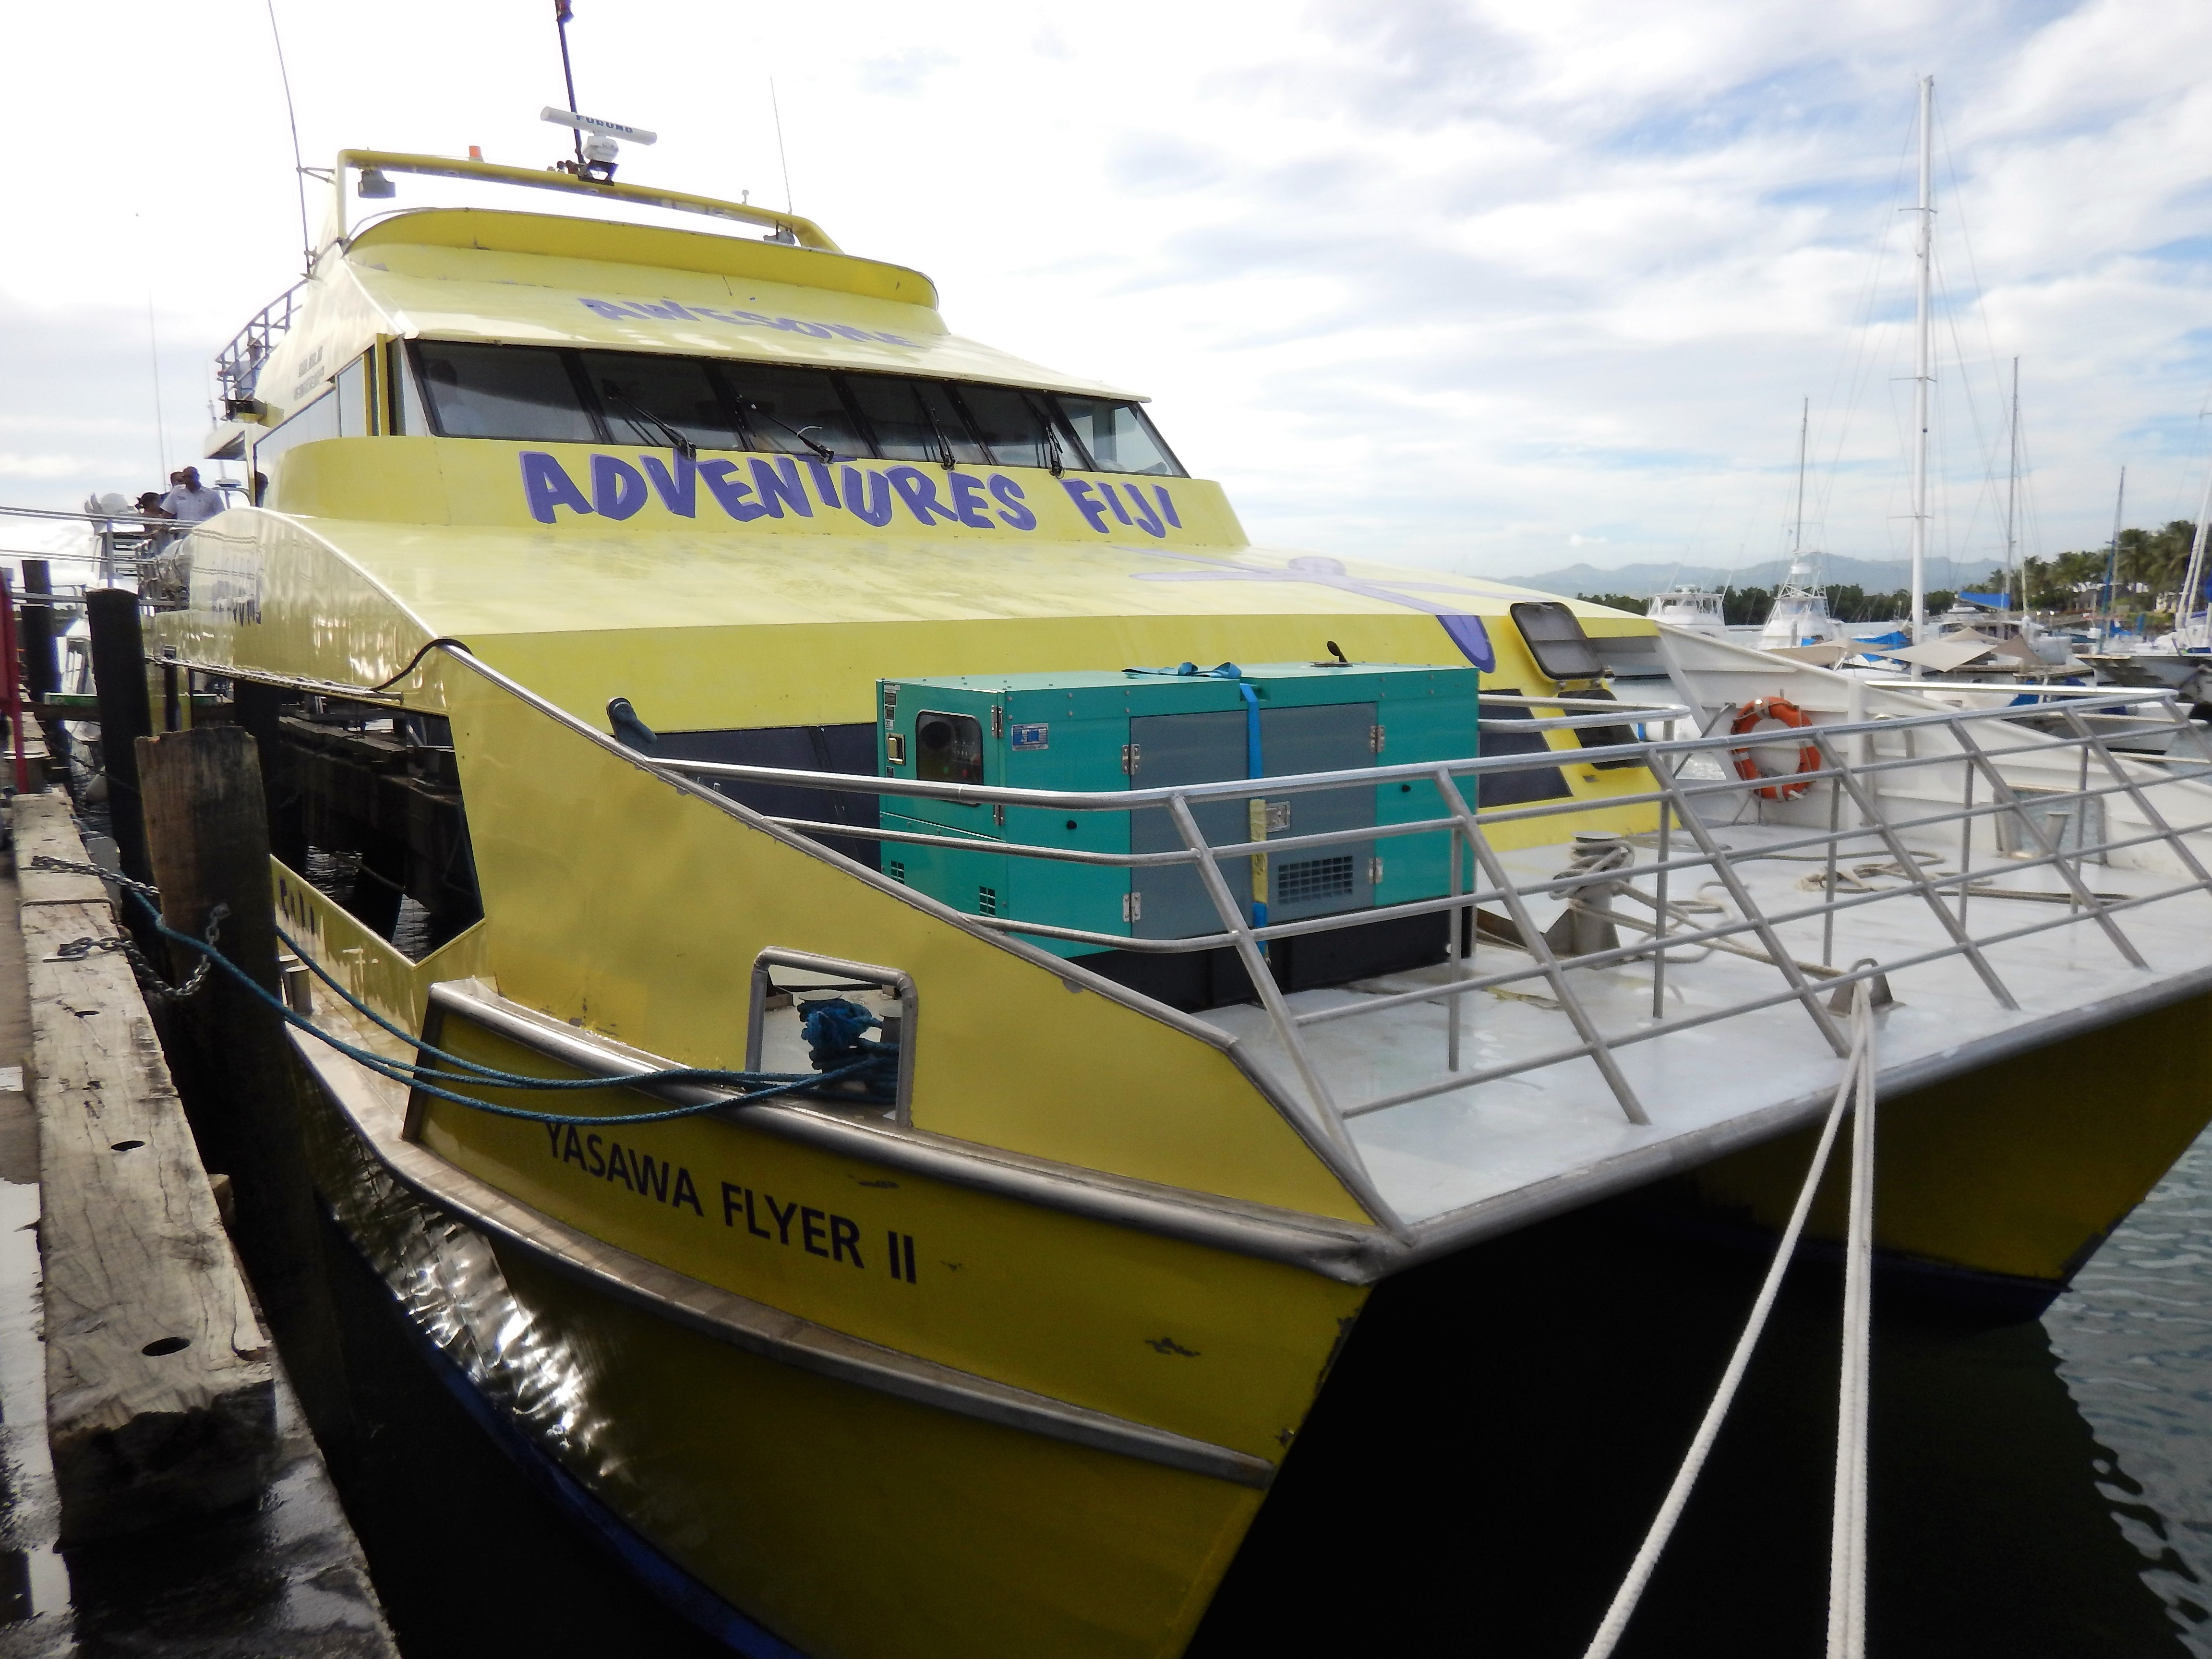 At dock in Port Denarau Marina